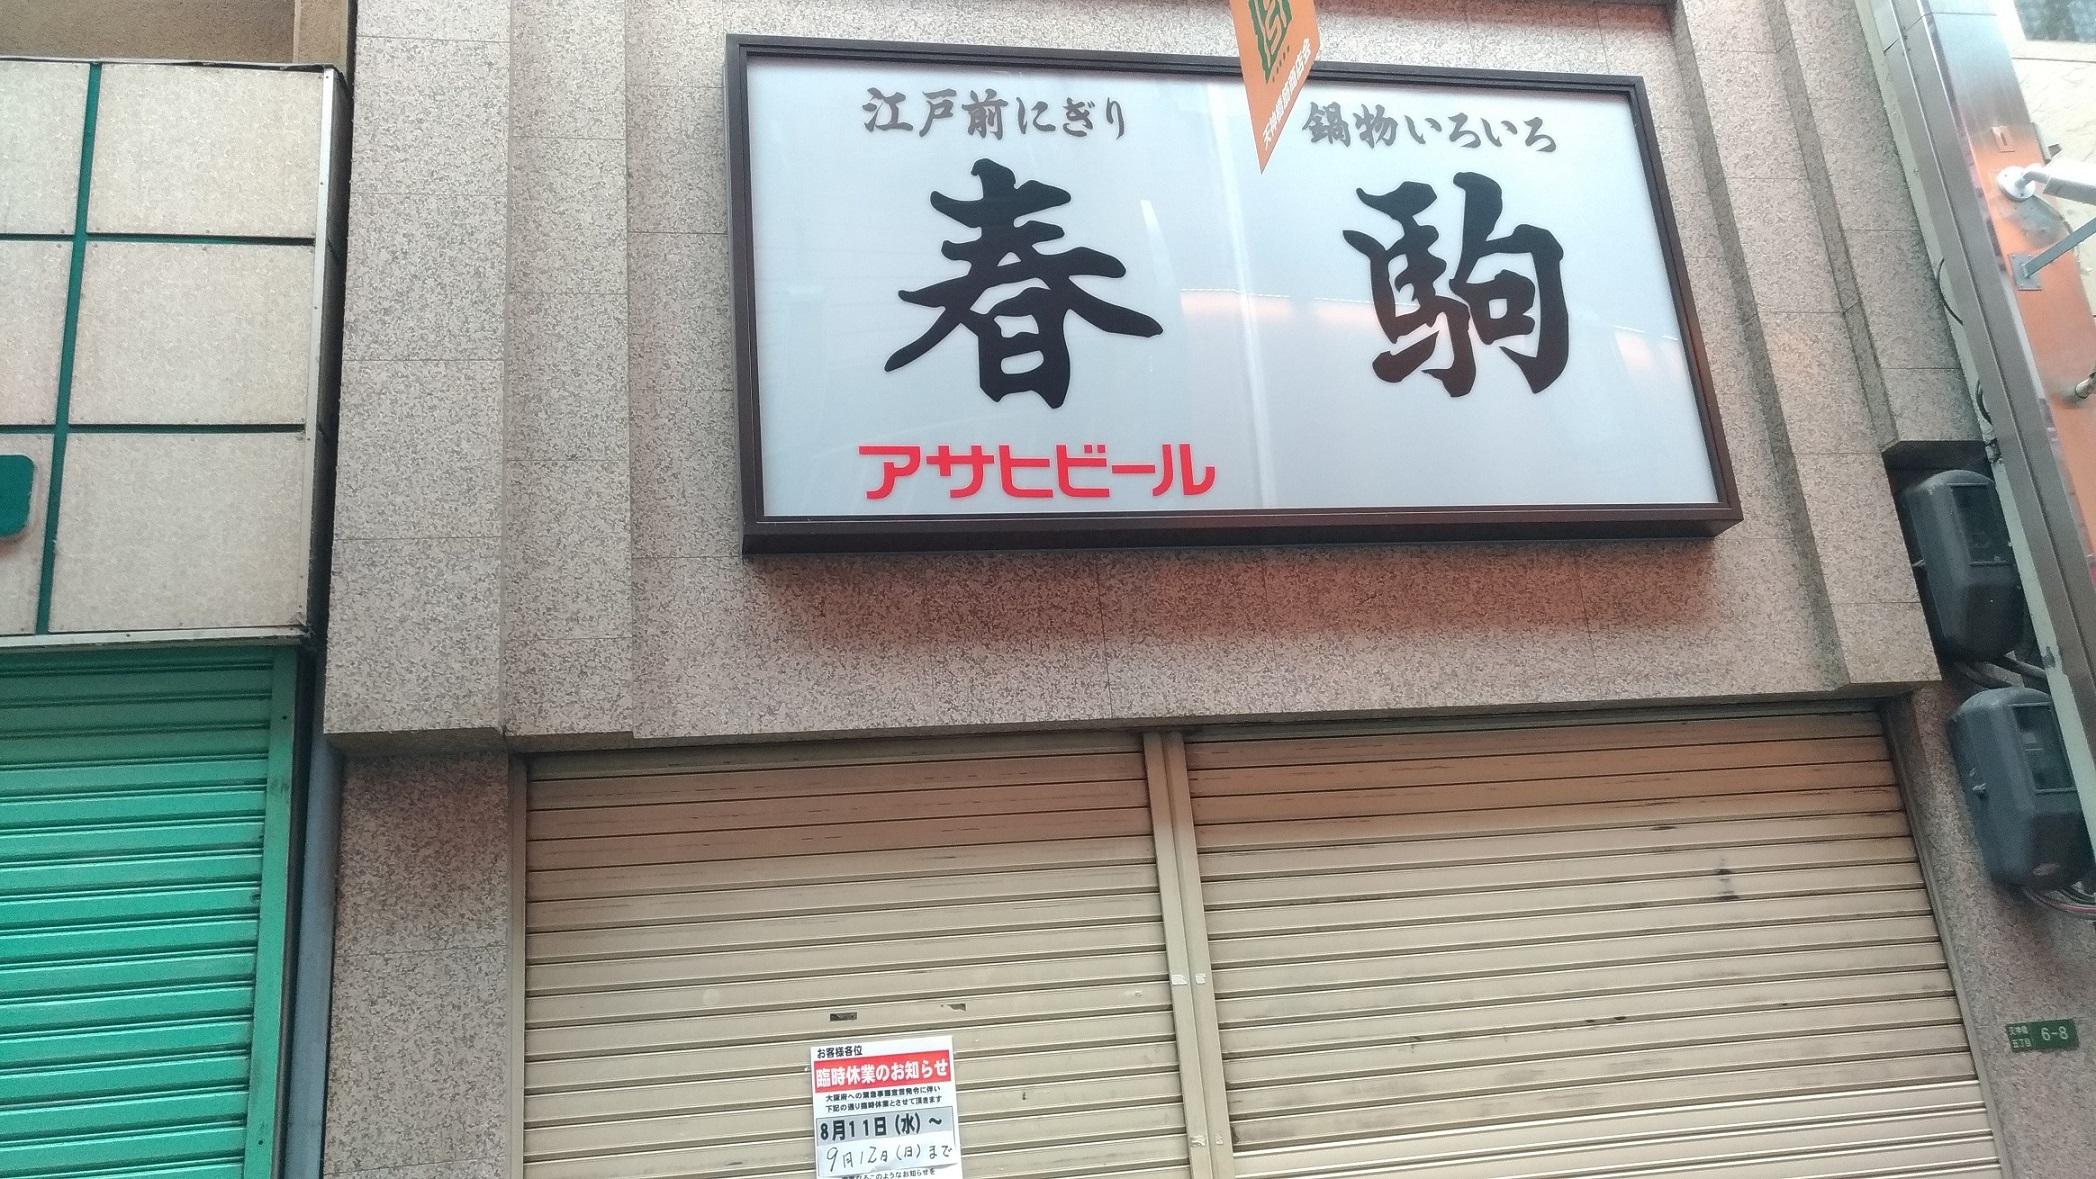 0osaka_sushi_1.jpg